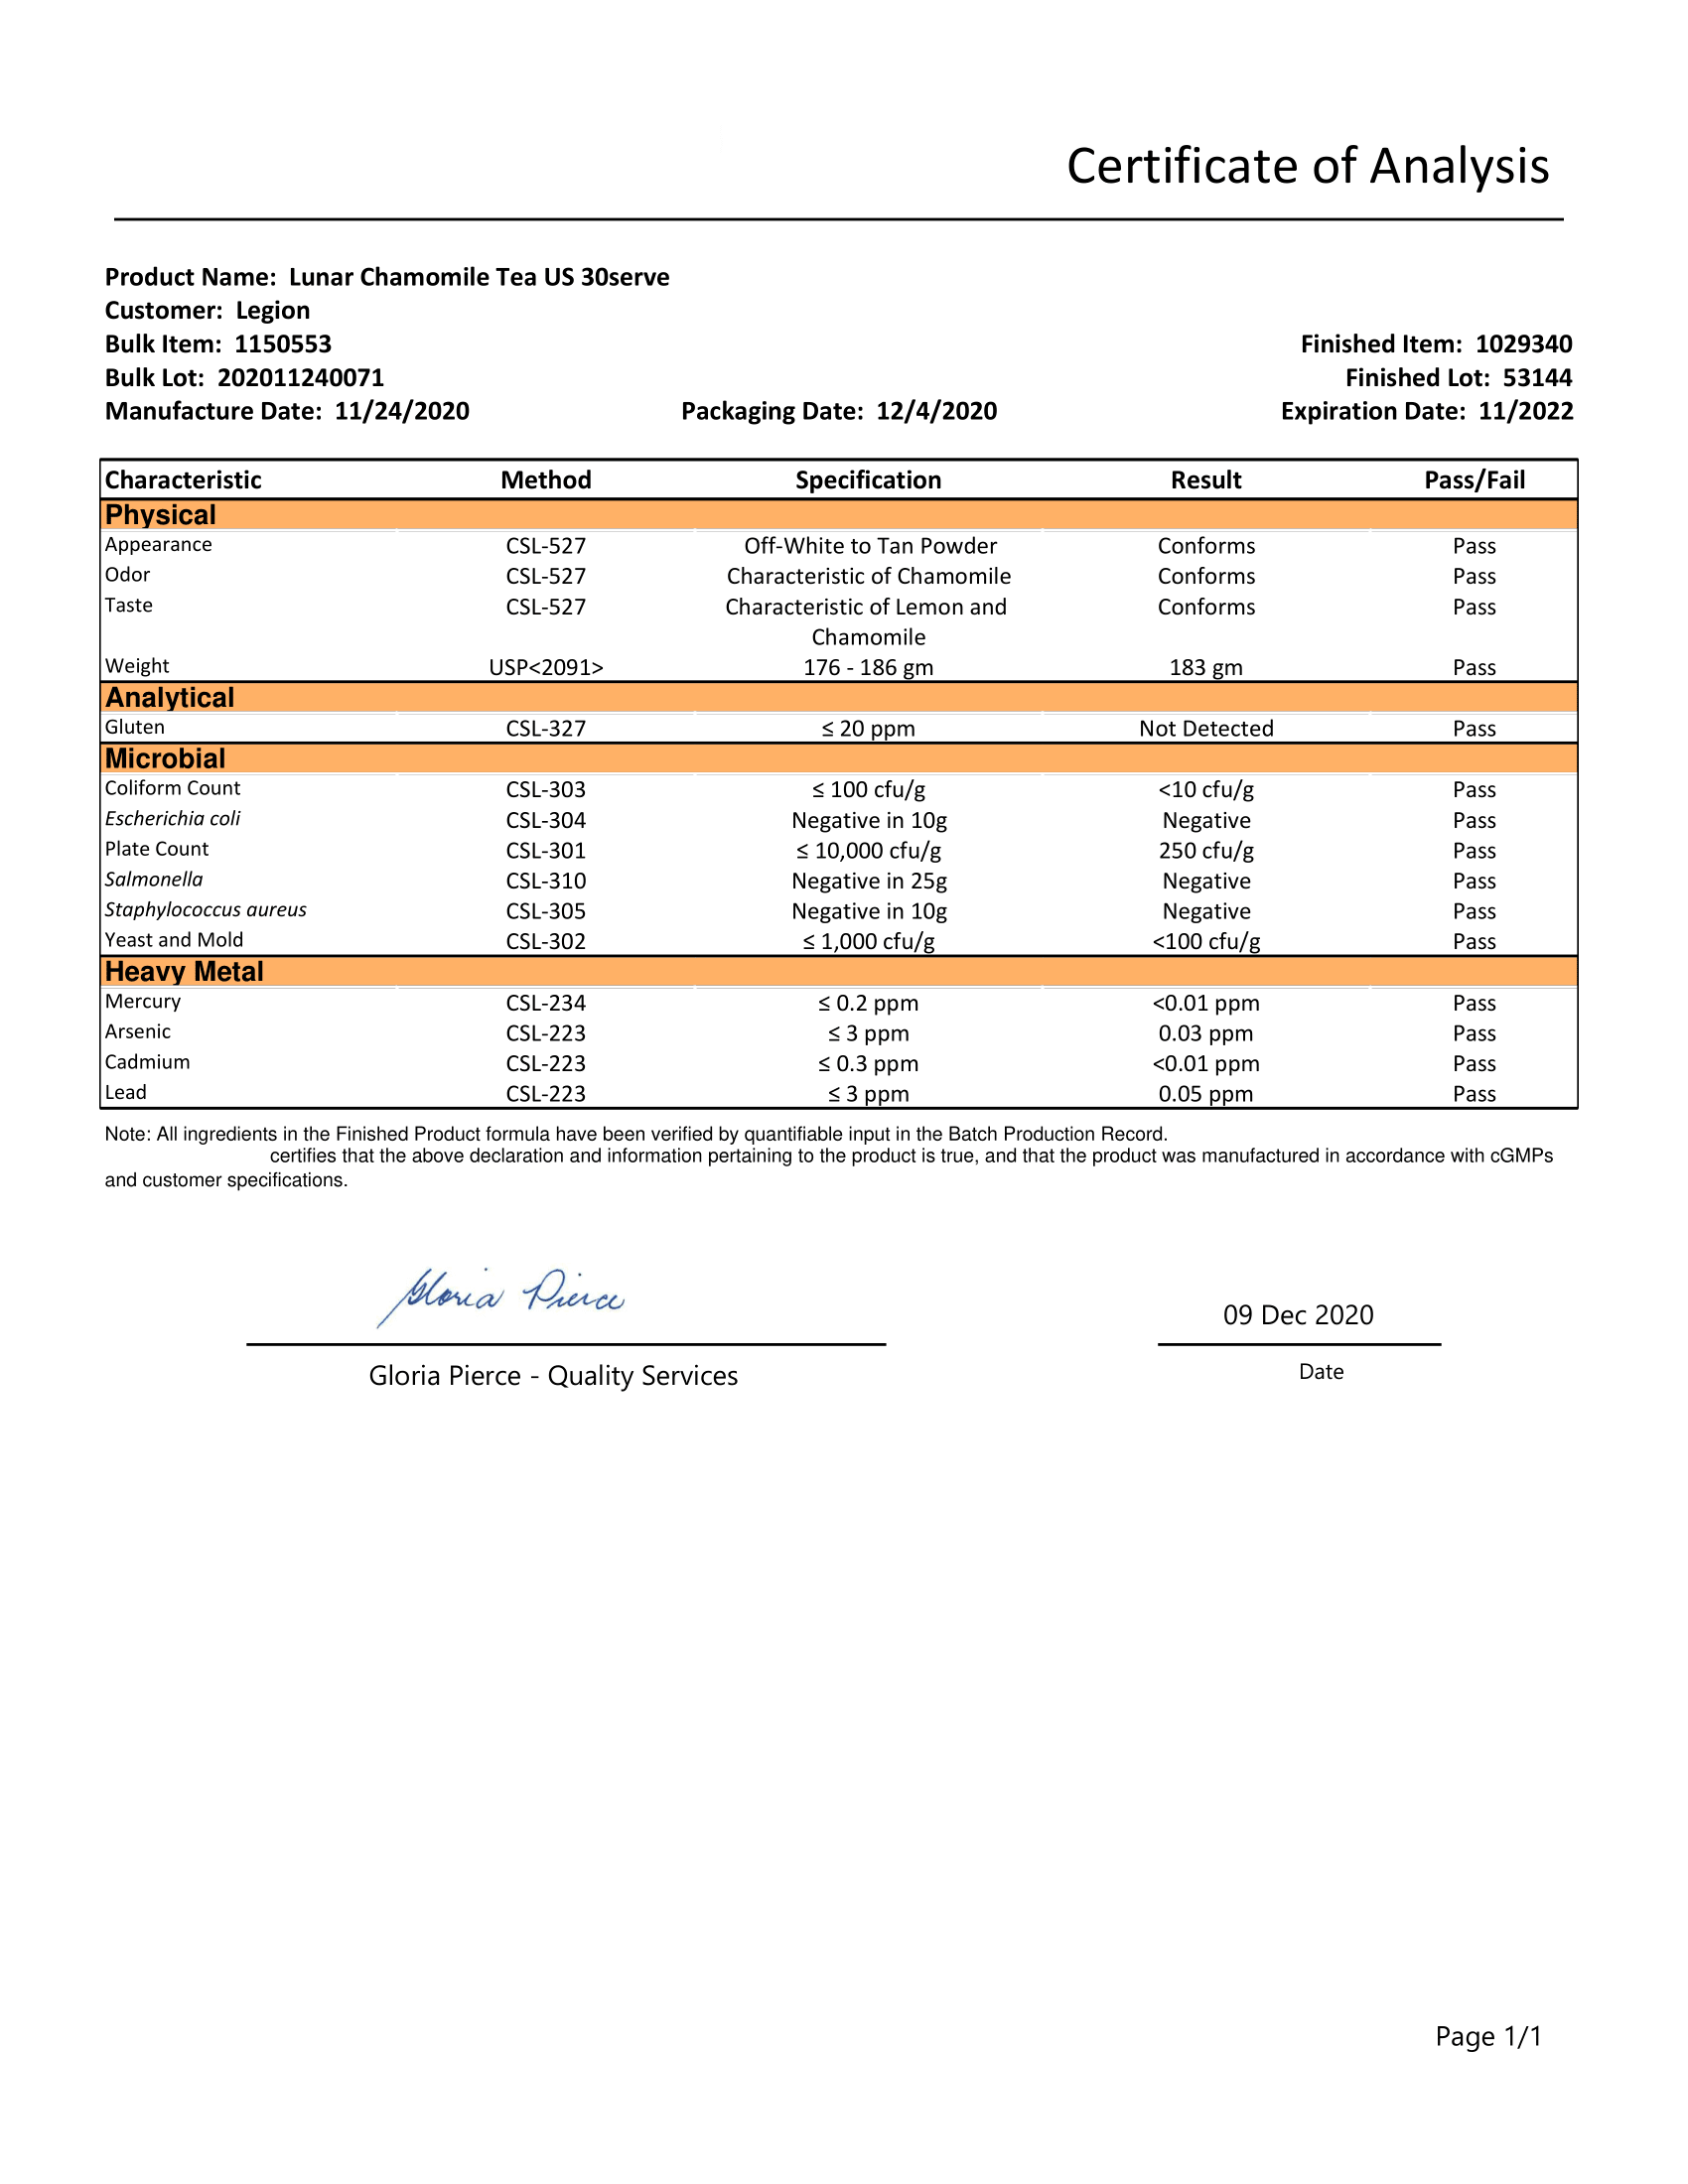 Lunar Lab Test Certificate